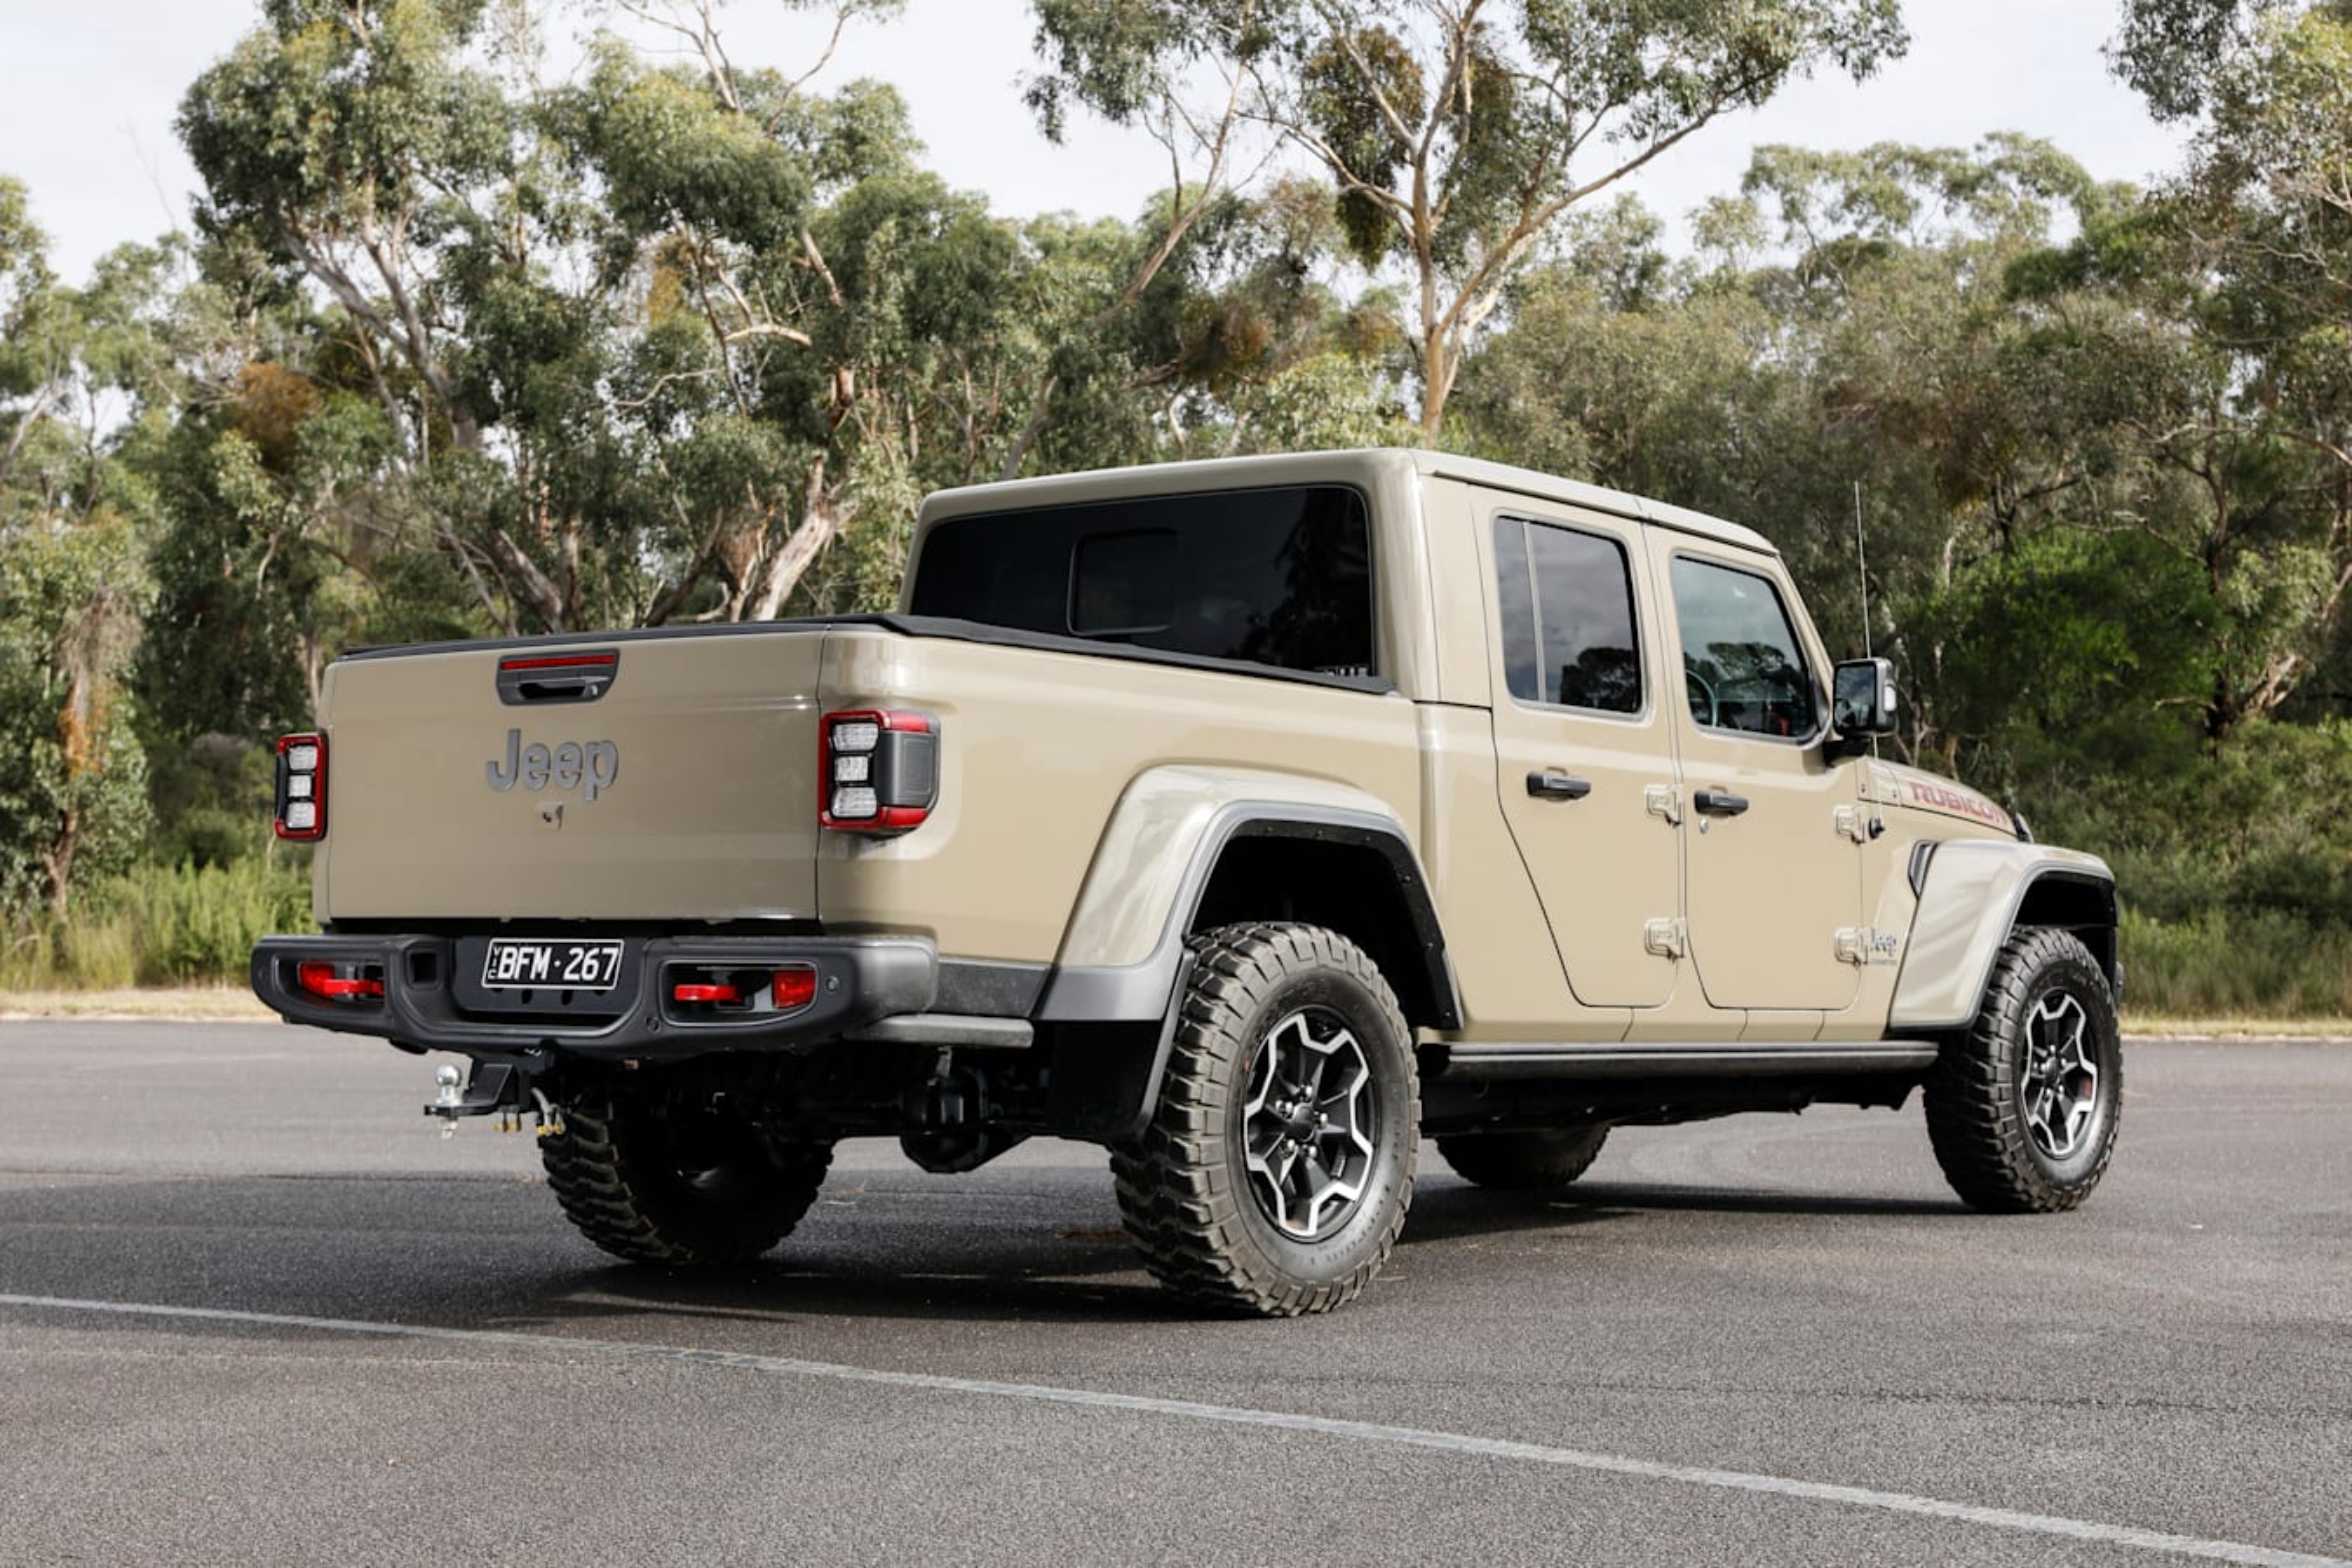 4 X 4 Australia Comparisons 2021 May 21 Jeep Gladiator Rear